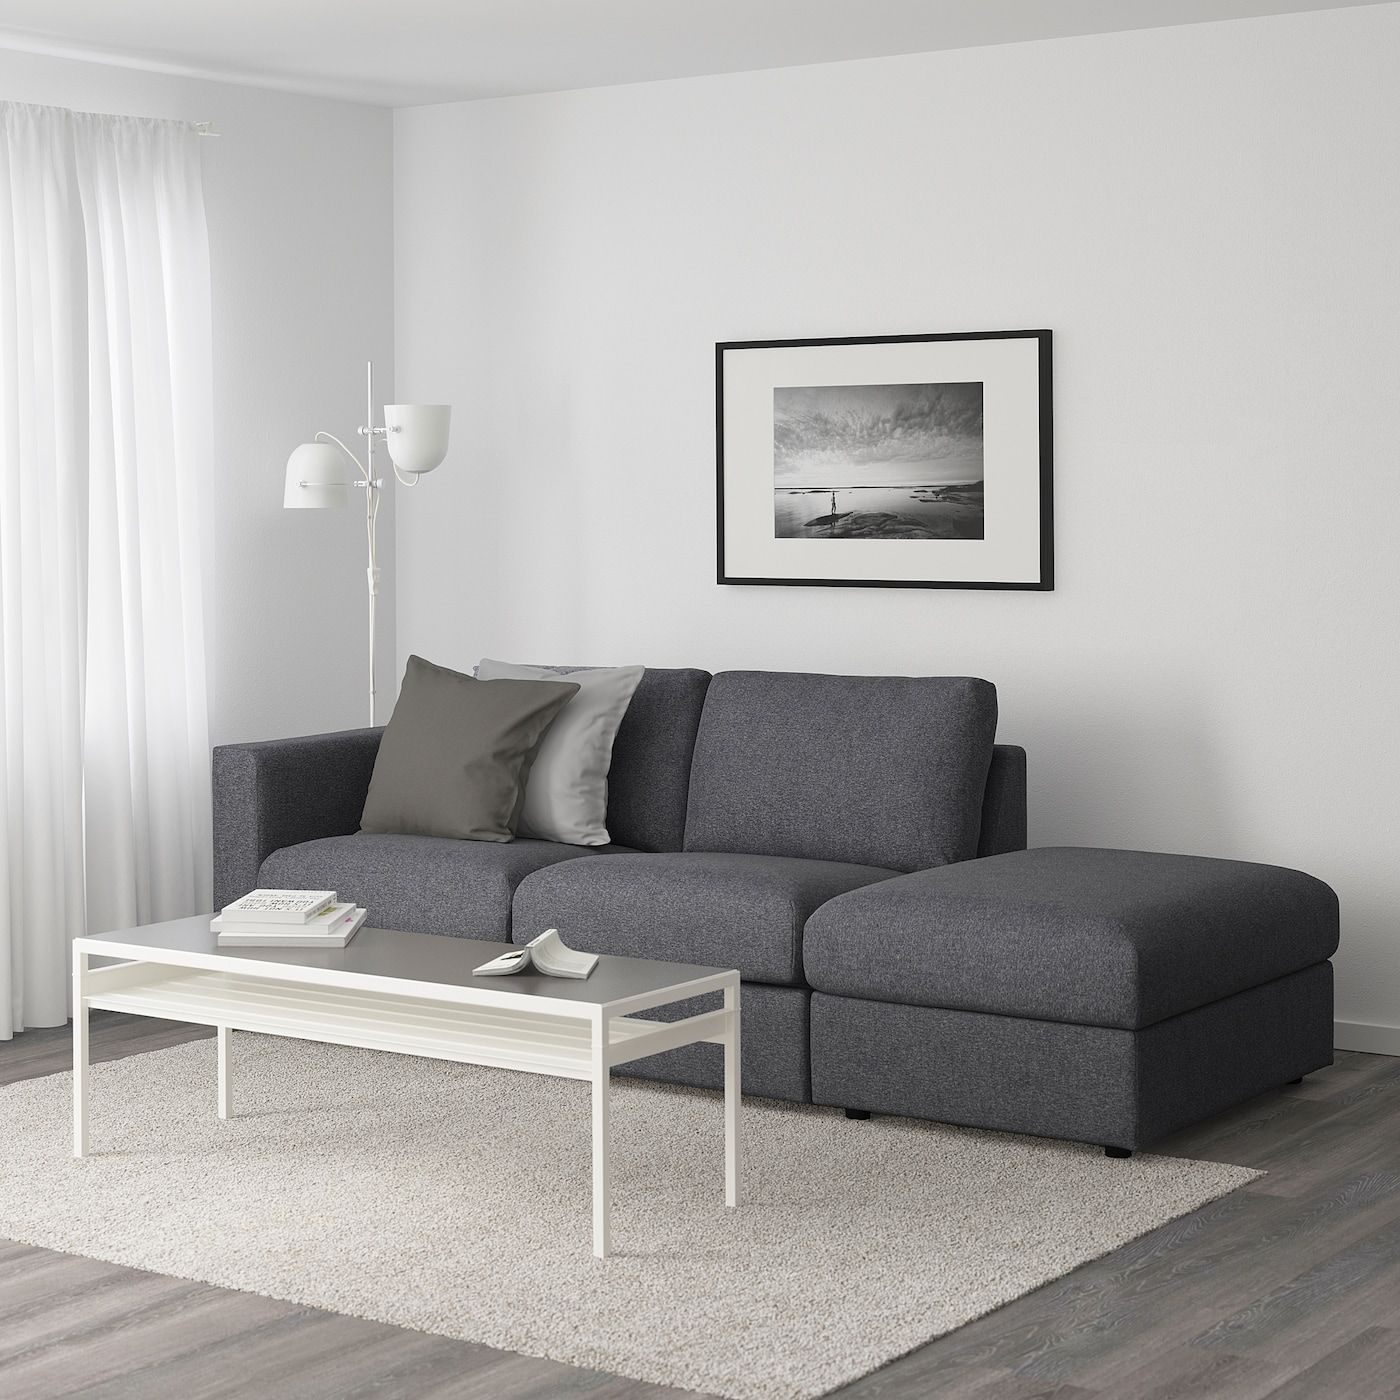 Ikea Vimle 3er Sofa Ohne Abschluss Gunnared Mittelgrau In 2020 3er Sofa Sofa Stoff 2er Sofa